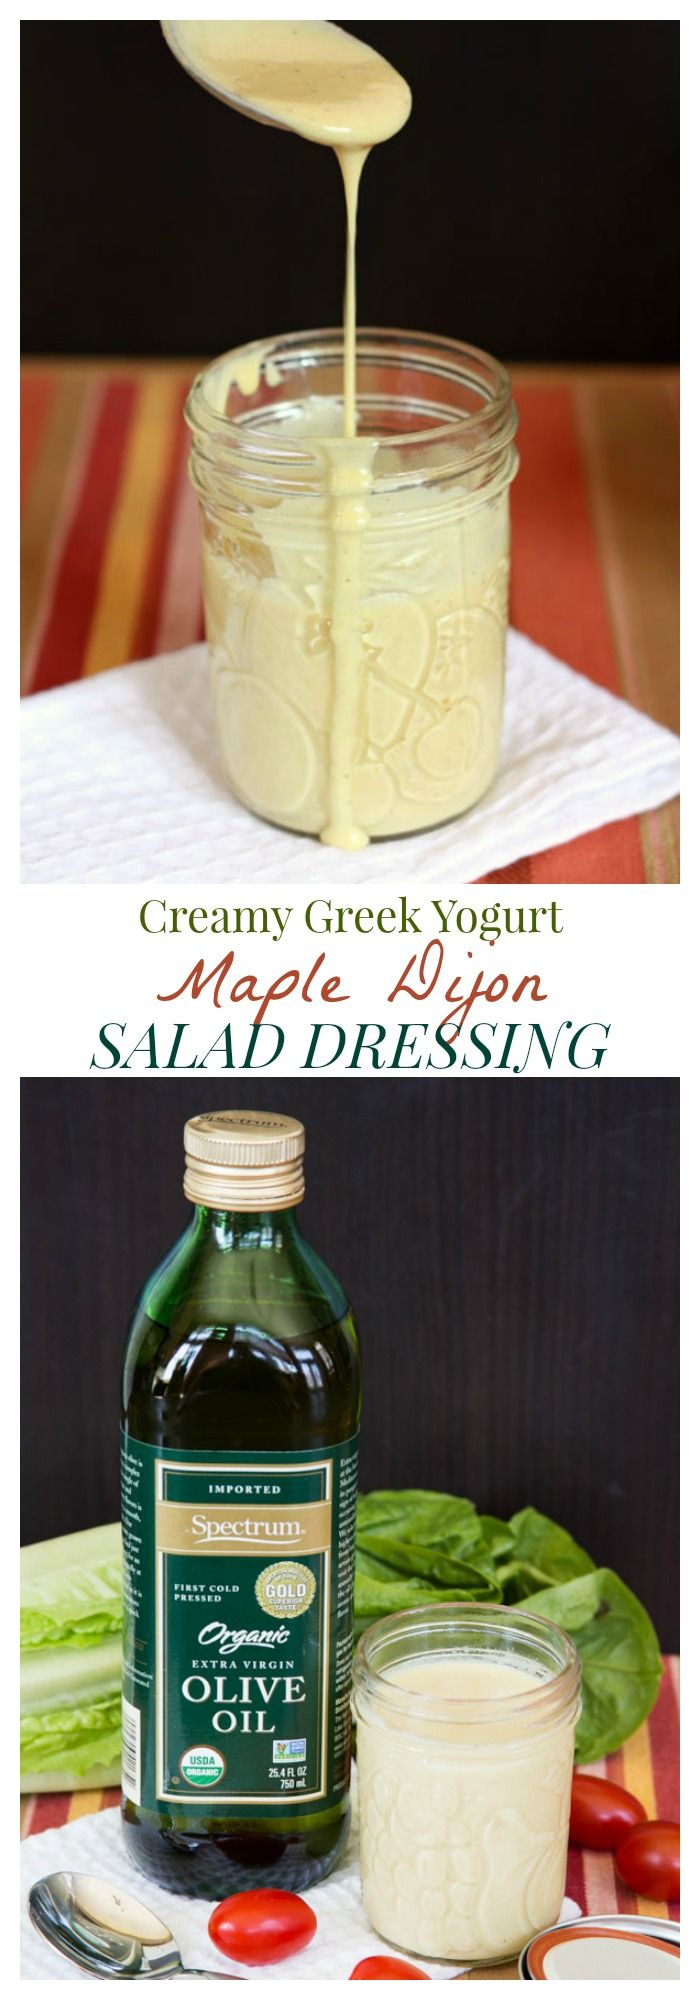 Creamy Maple Dijon Greek Yogurt Salad Dressing - it's so easy to make your own rich, creamy but still light and healthy dressing   cupcakesandkalechips.com   gluten free recipe